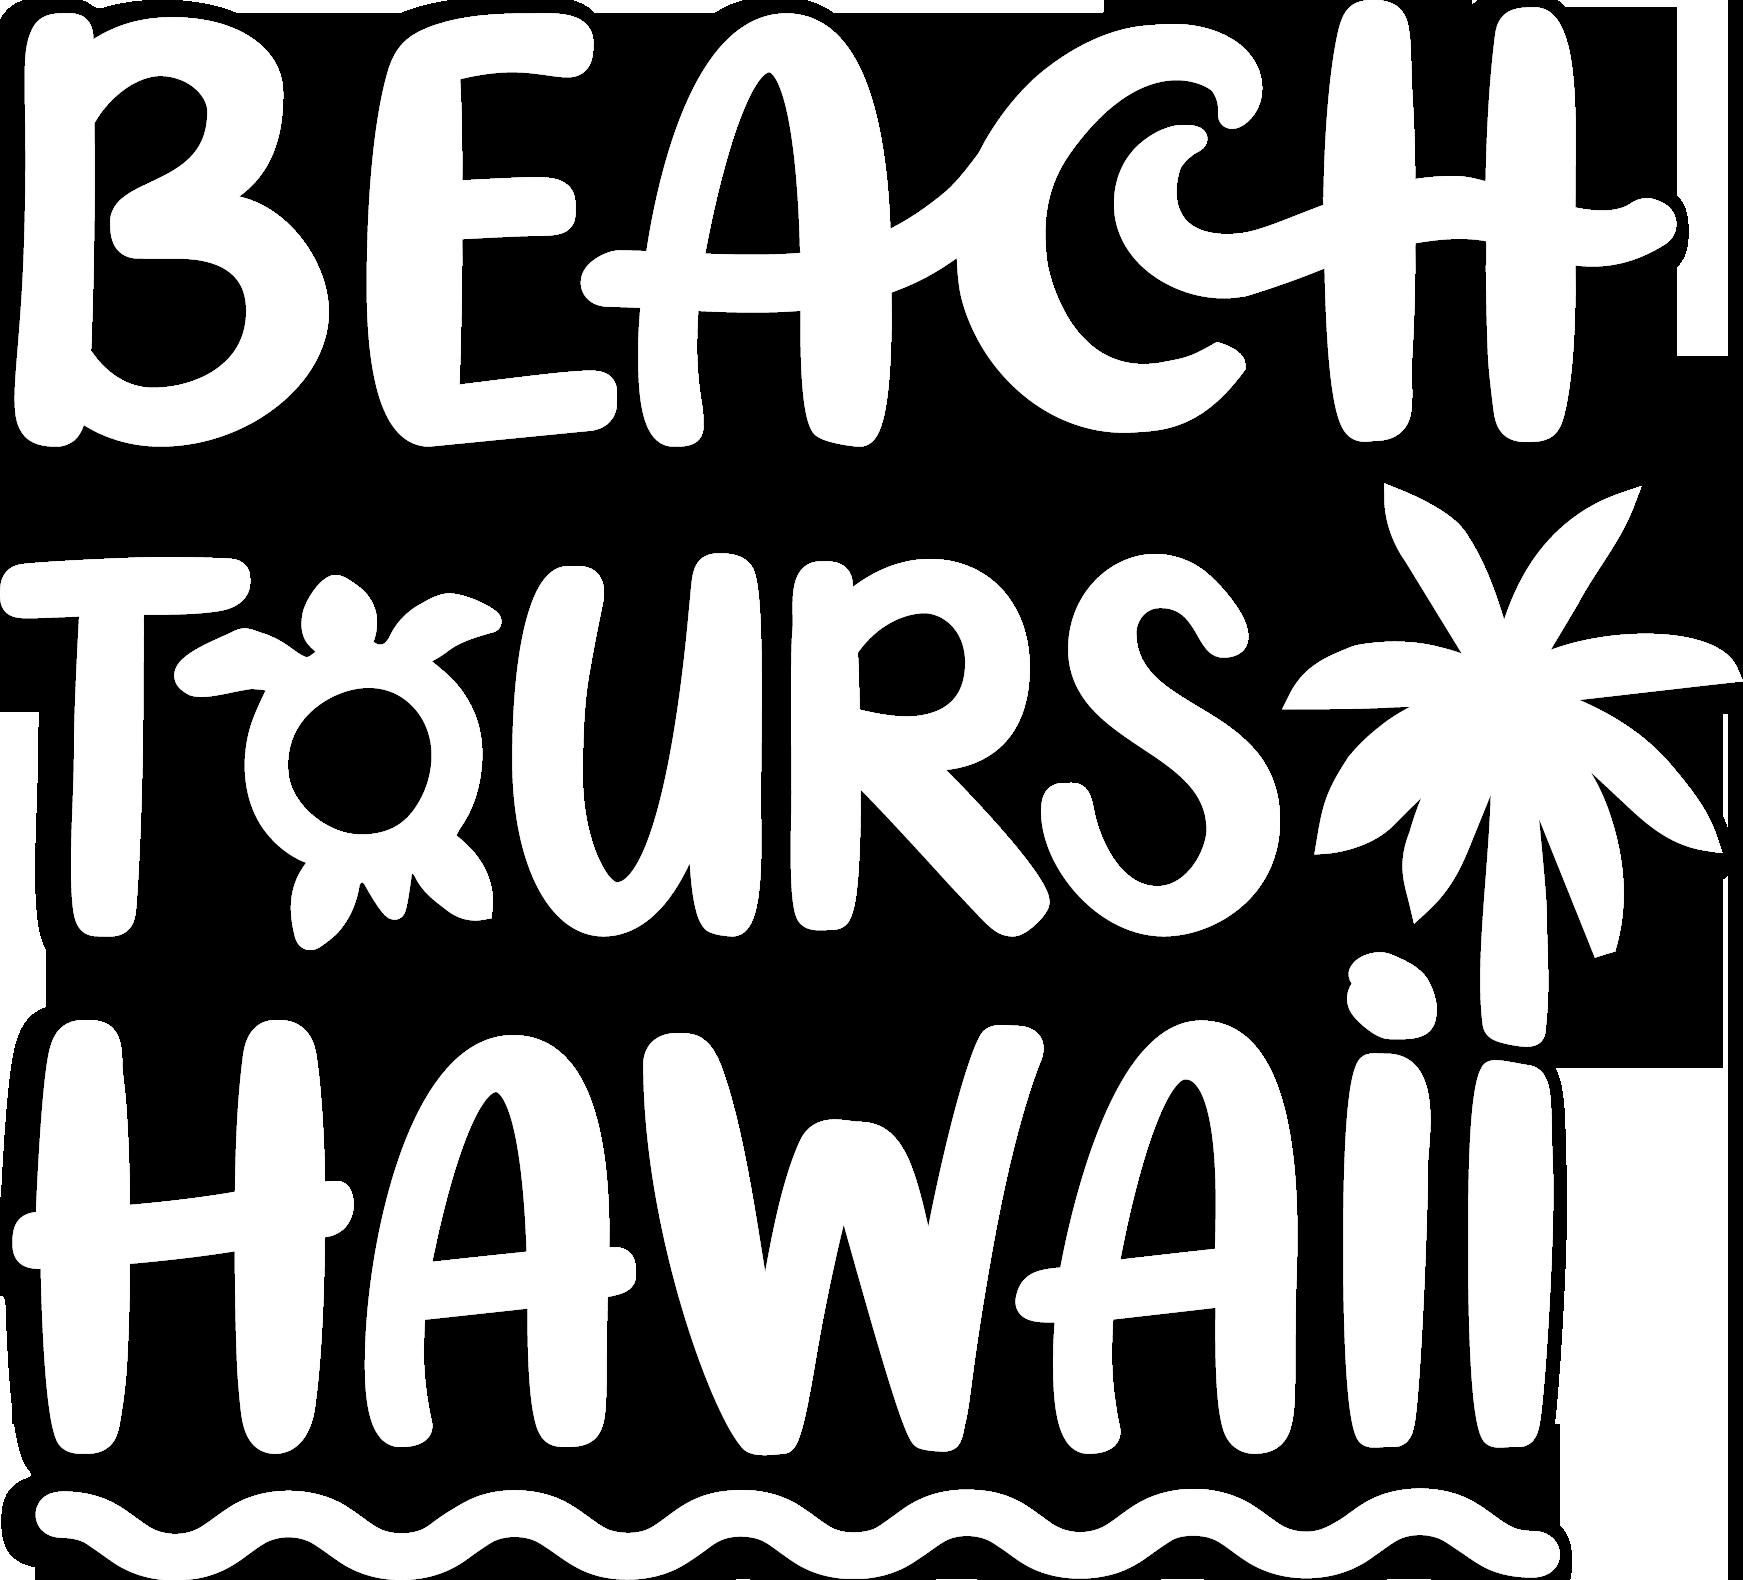 Beach Tours Hawaii